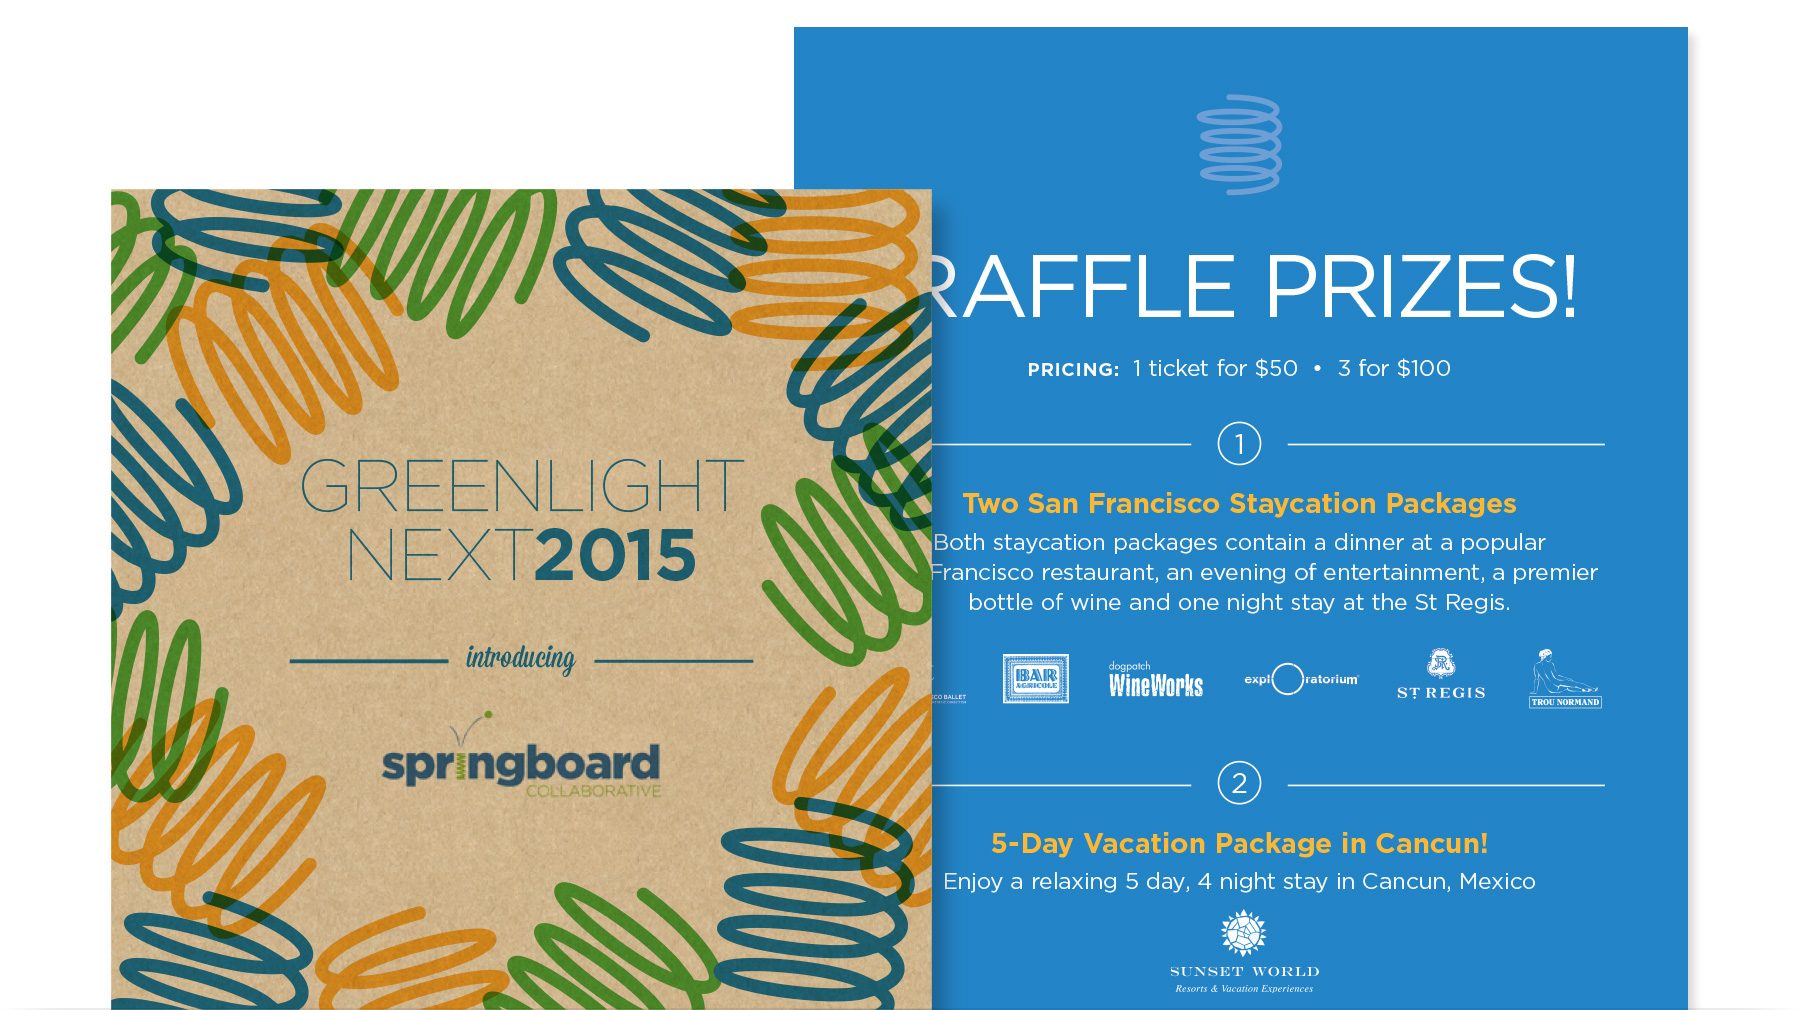 GreenLight Fund Bay Area NEXT 2015